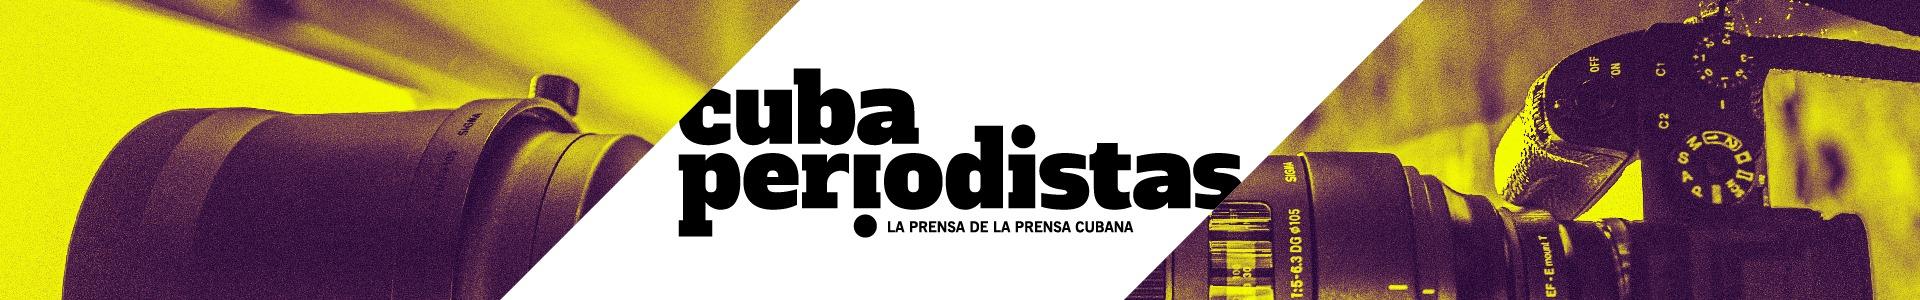 Cubaperiodistas